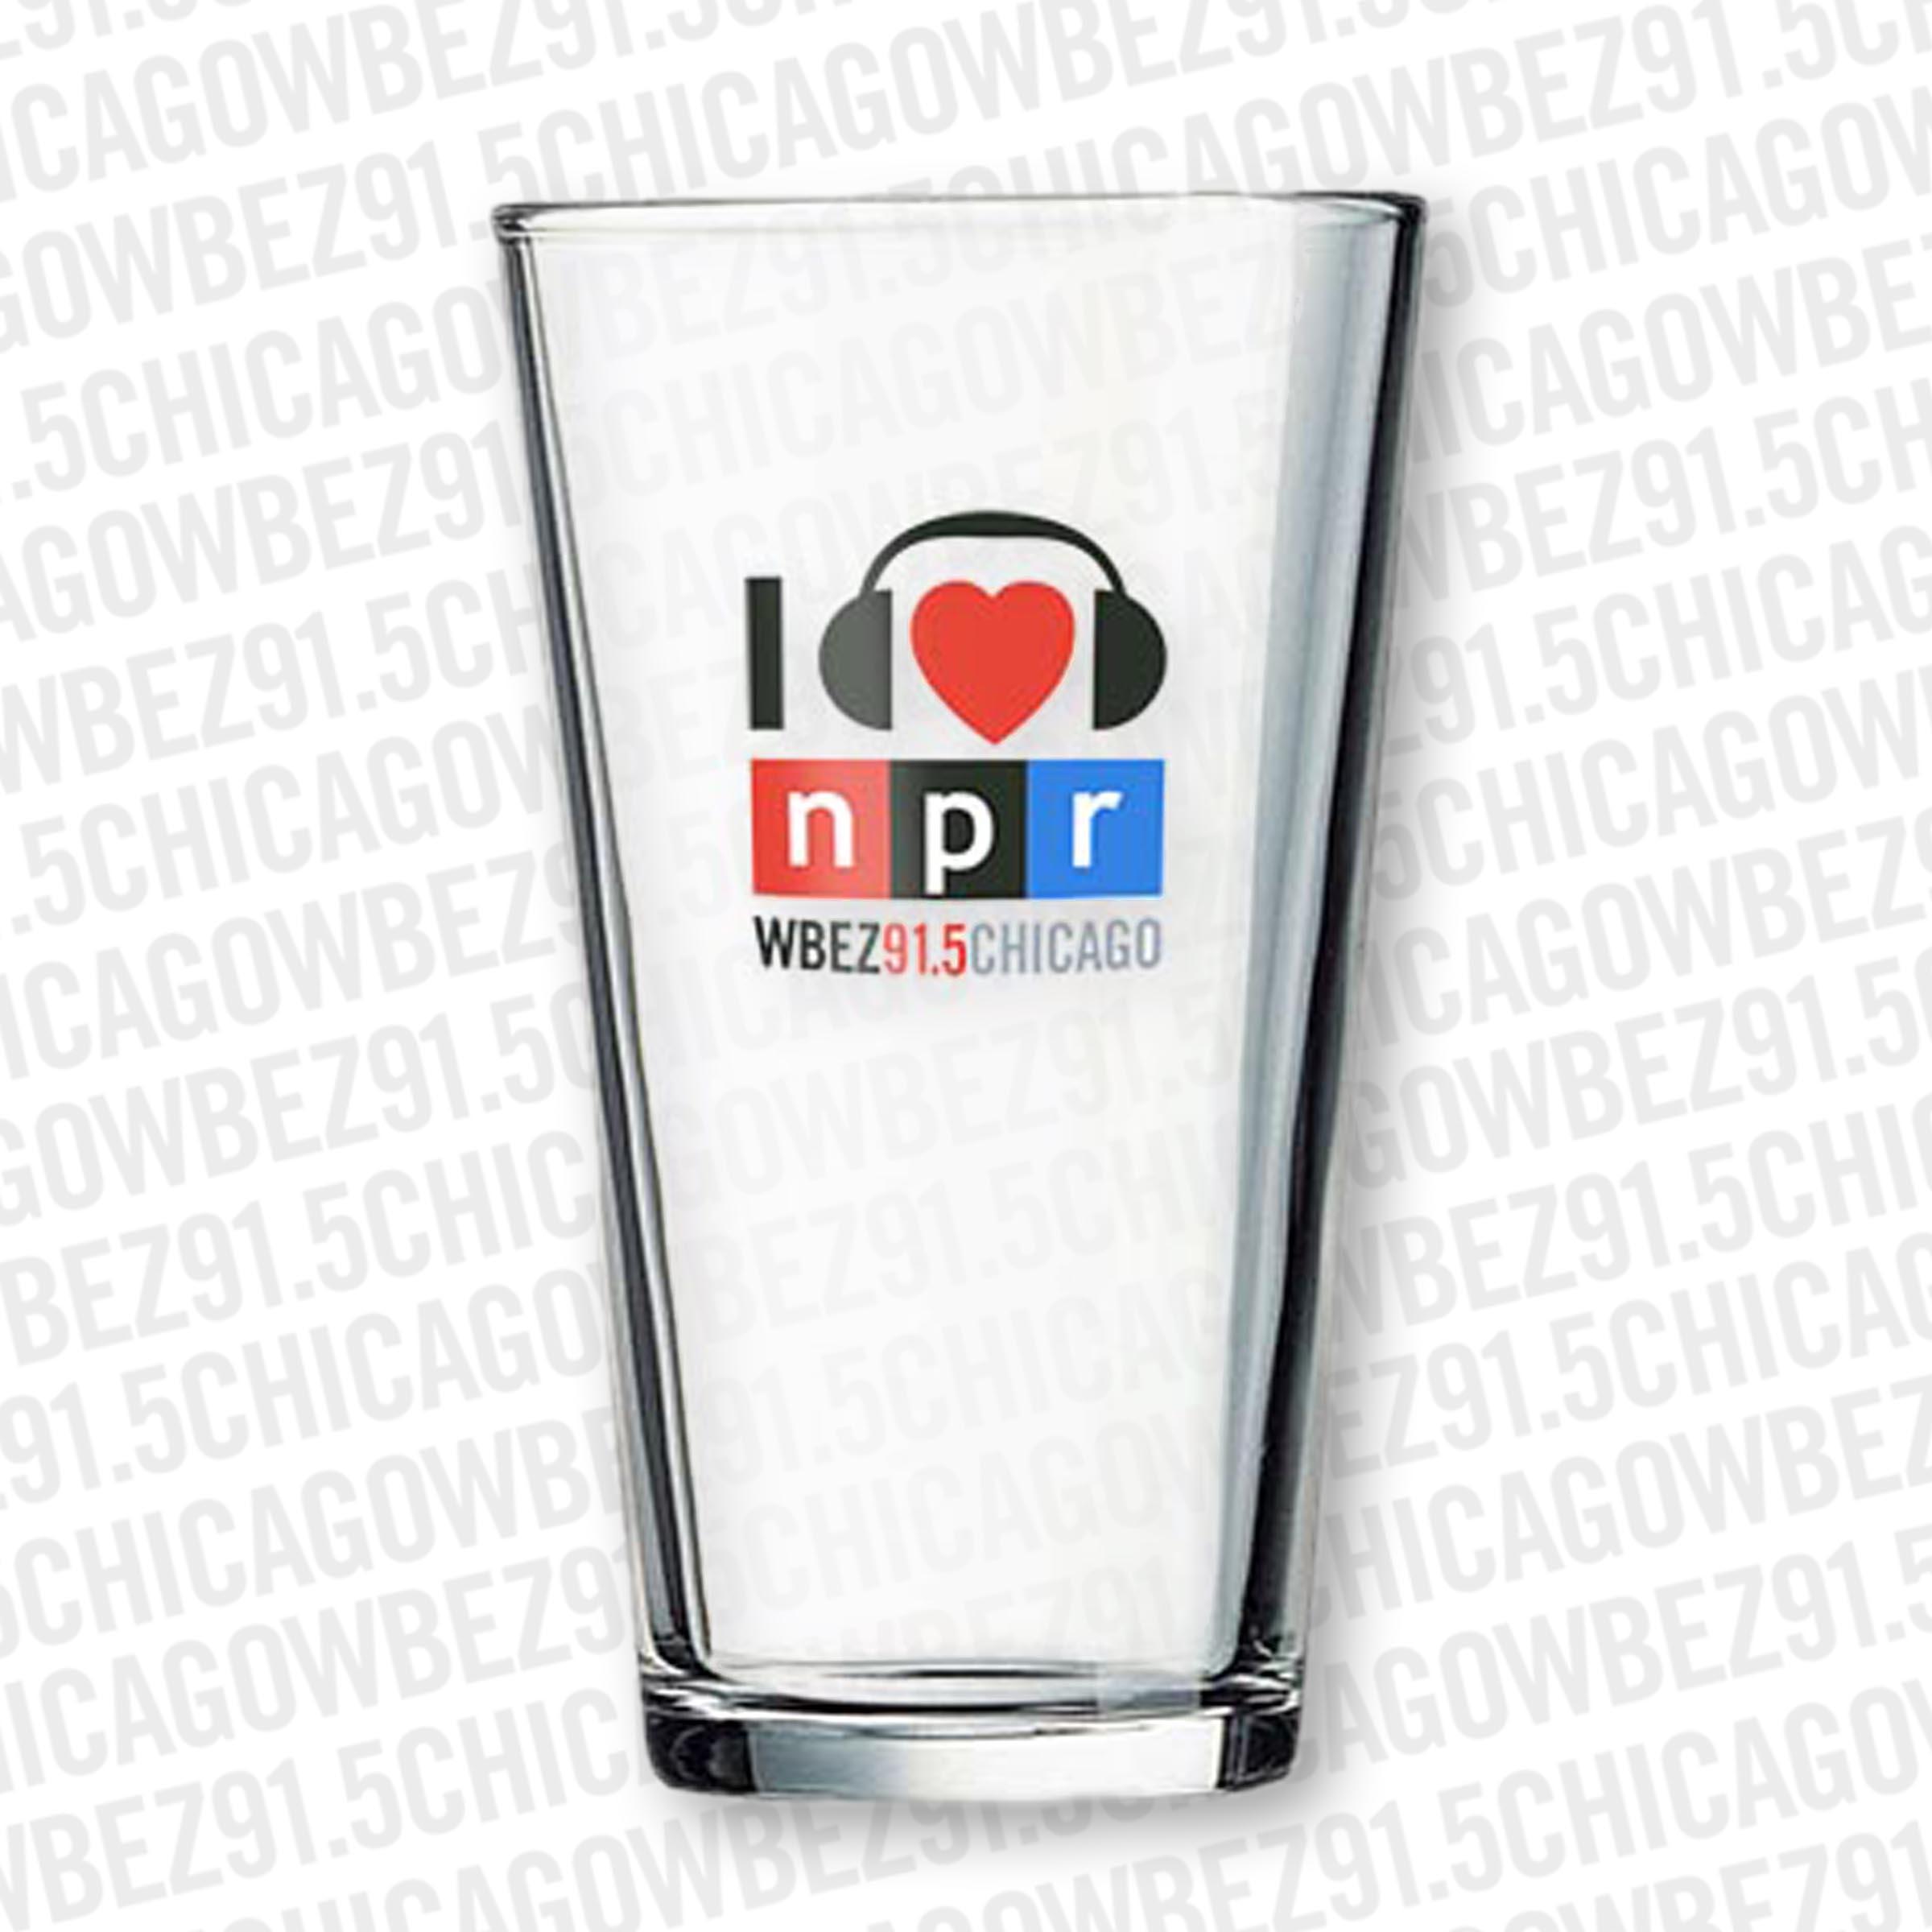 I Heart NPR Pint Glass